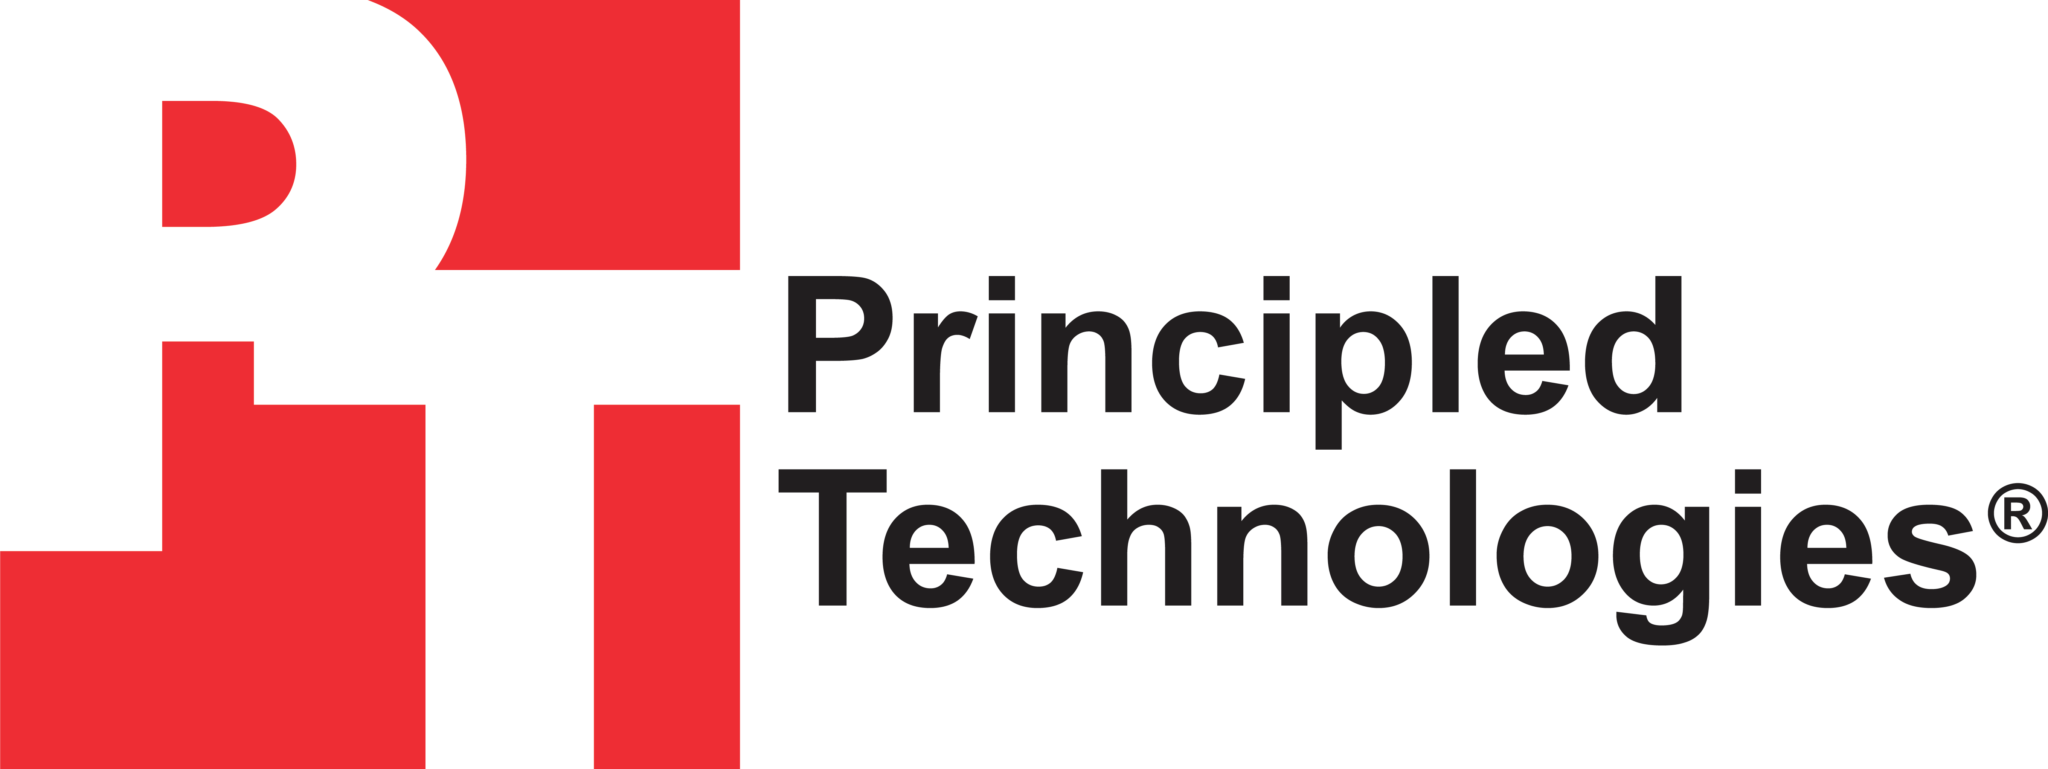 Principled Technologies logo